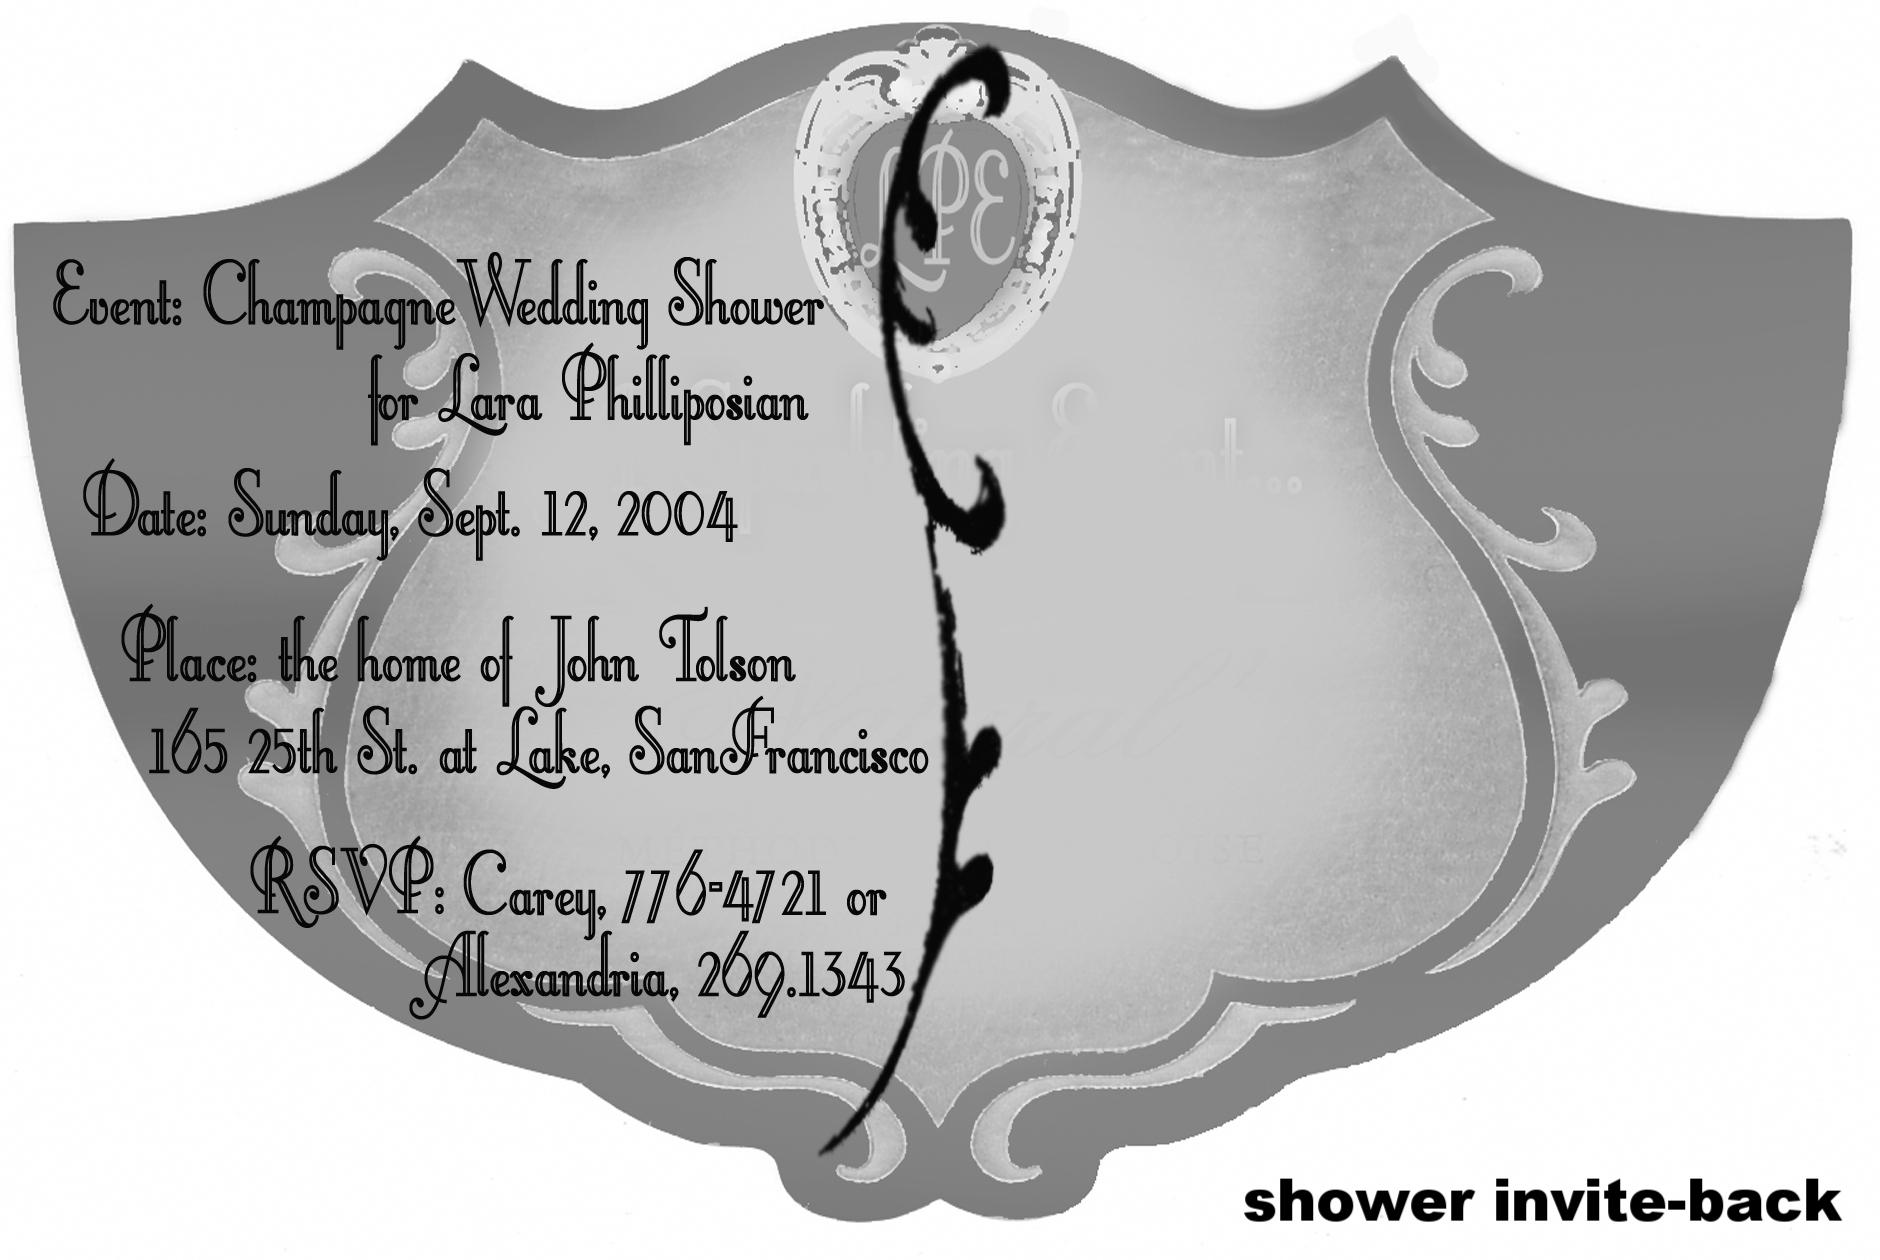 shower invite-back copy.jpg